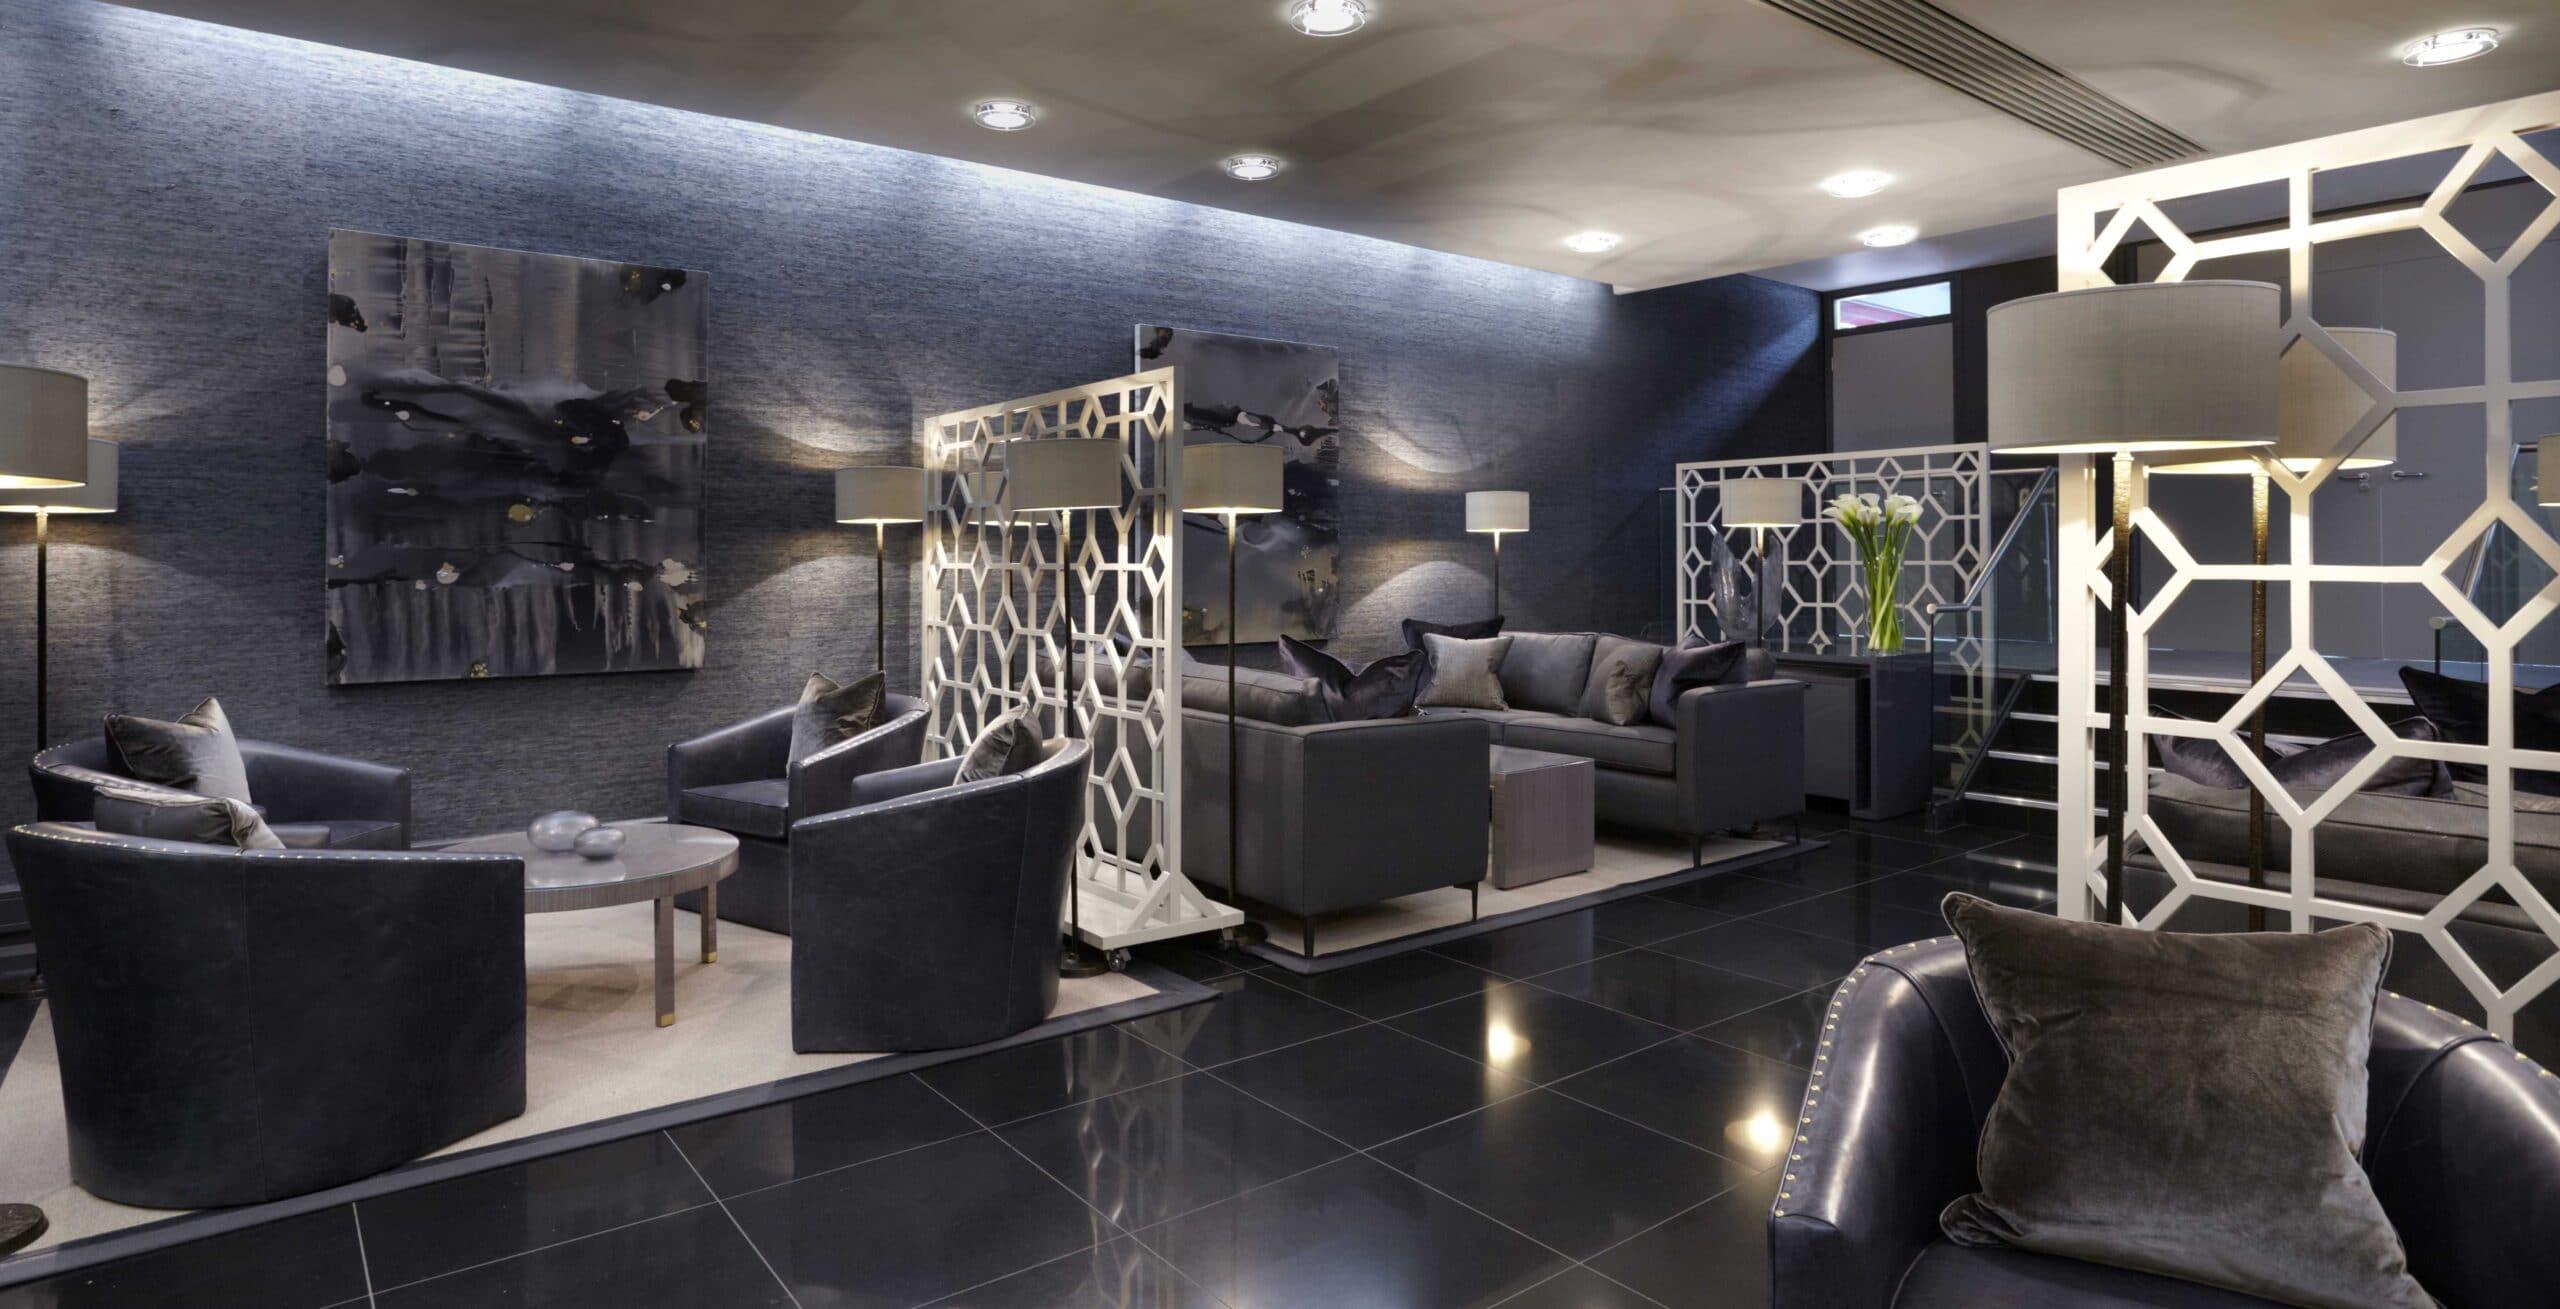 Heathrow airport interior design project